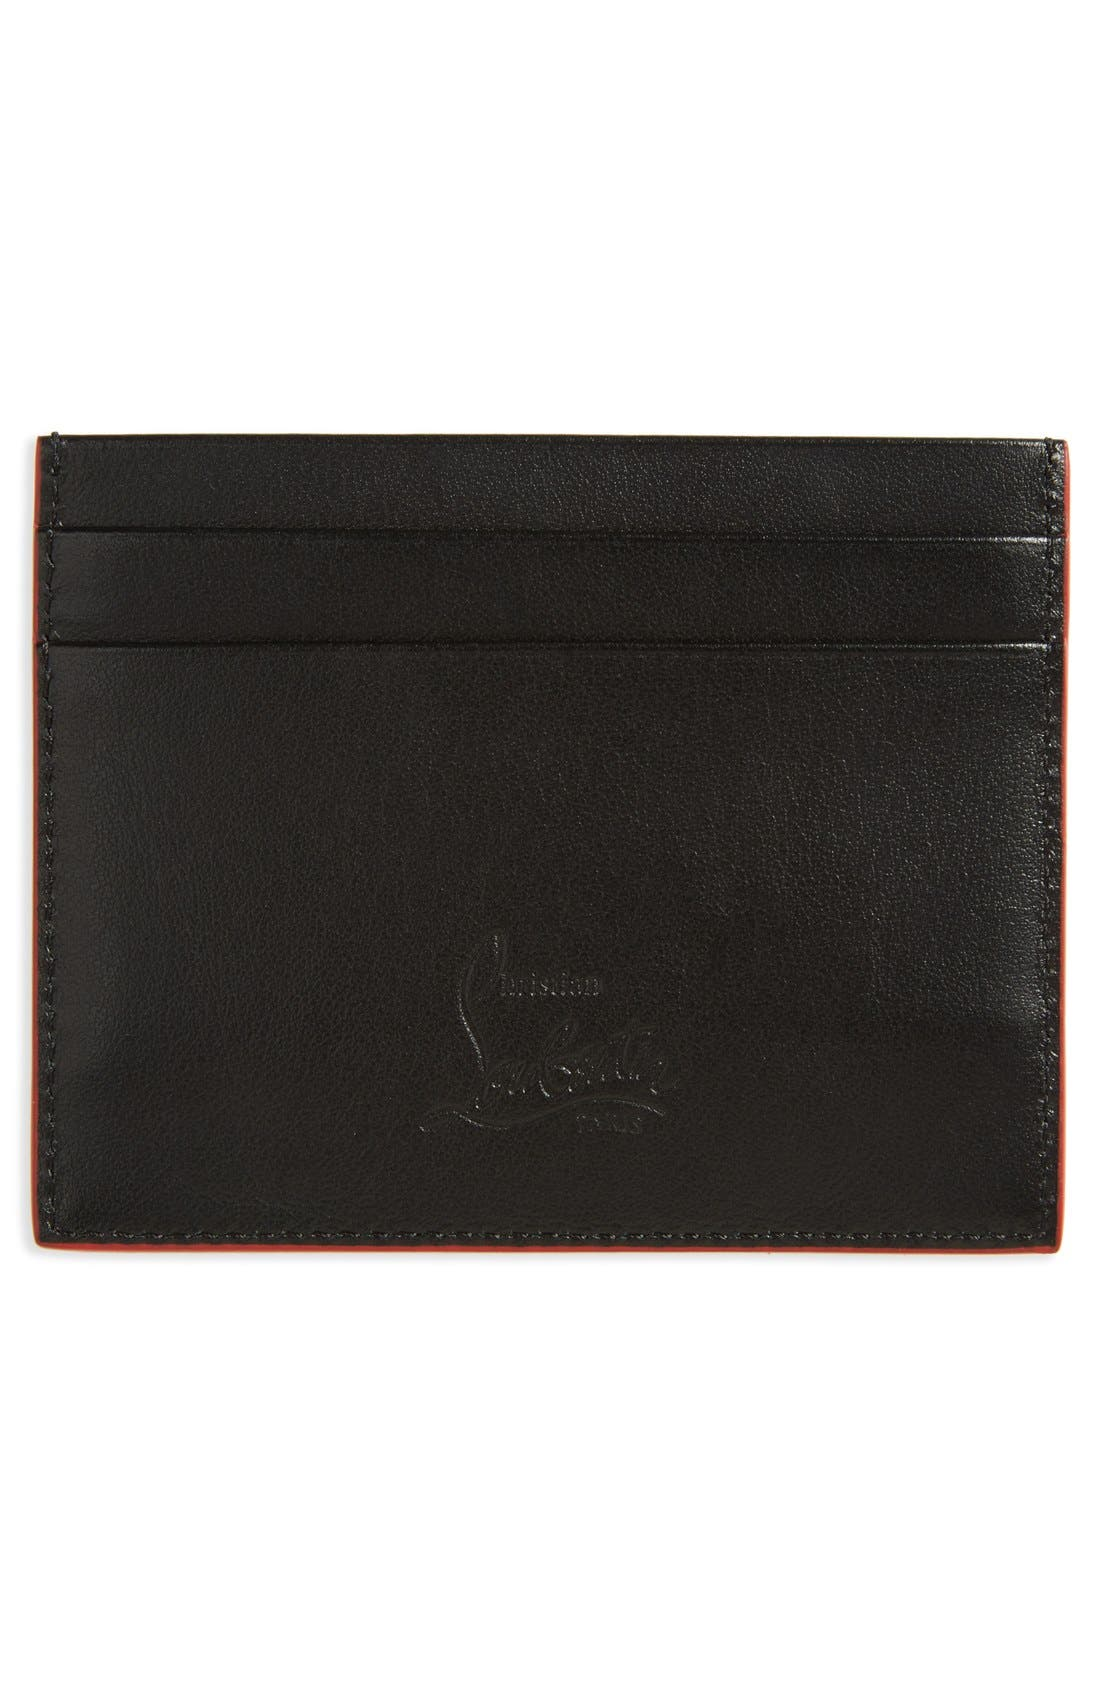 'Kios' Spiked Calfskin Leather Card Case,                             Alternate thumbnail 2, color,                             001